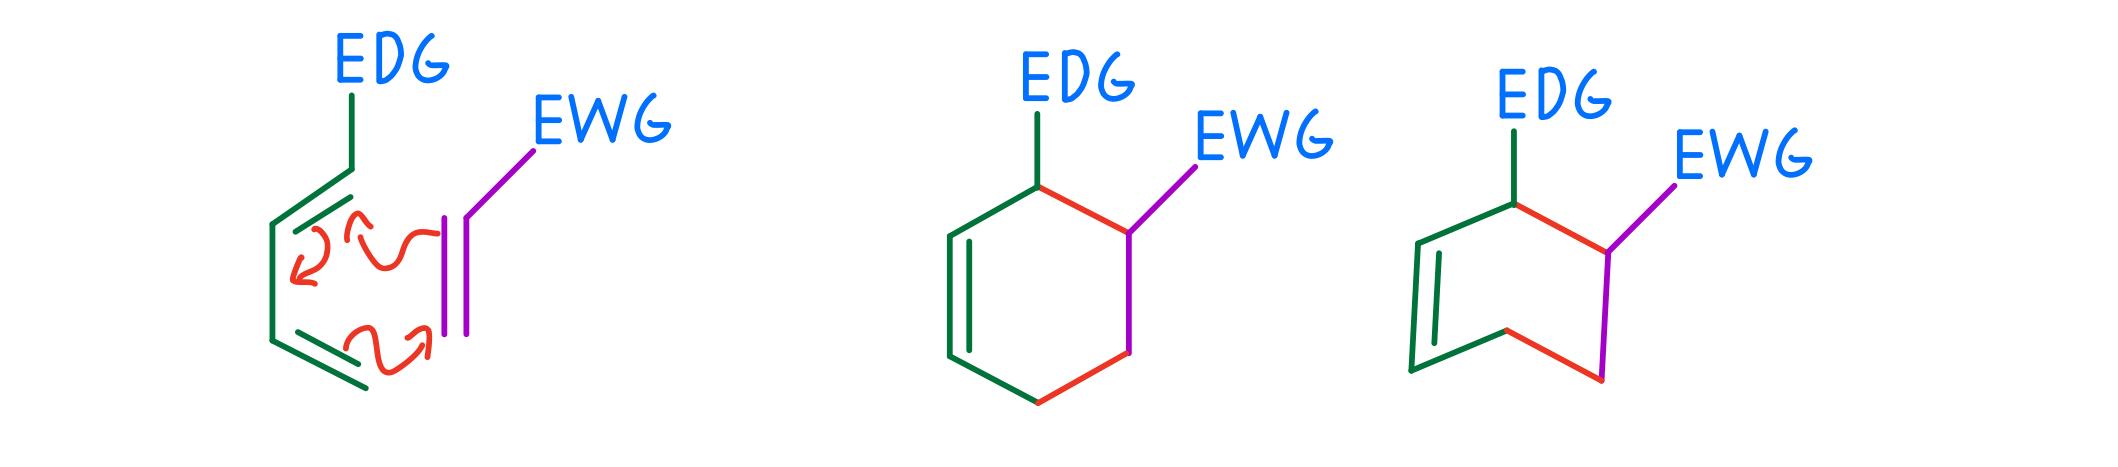 EDGs-and-EWGs